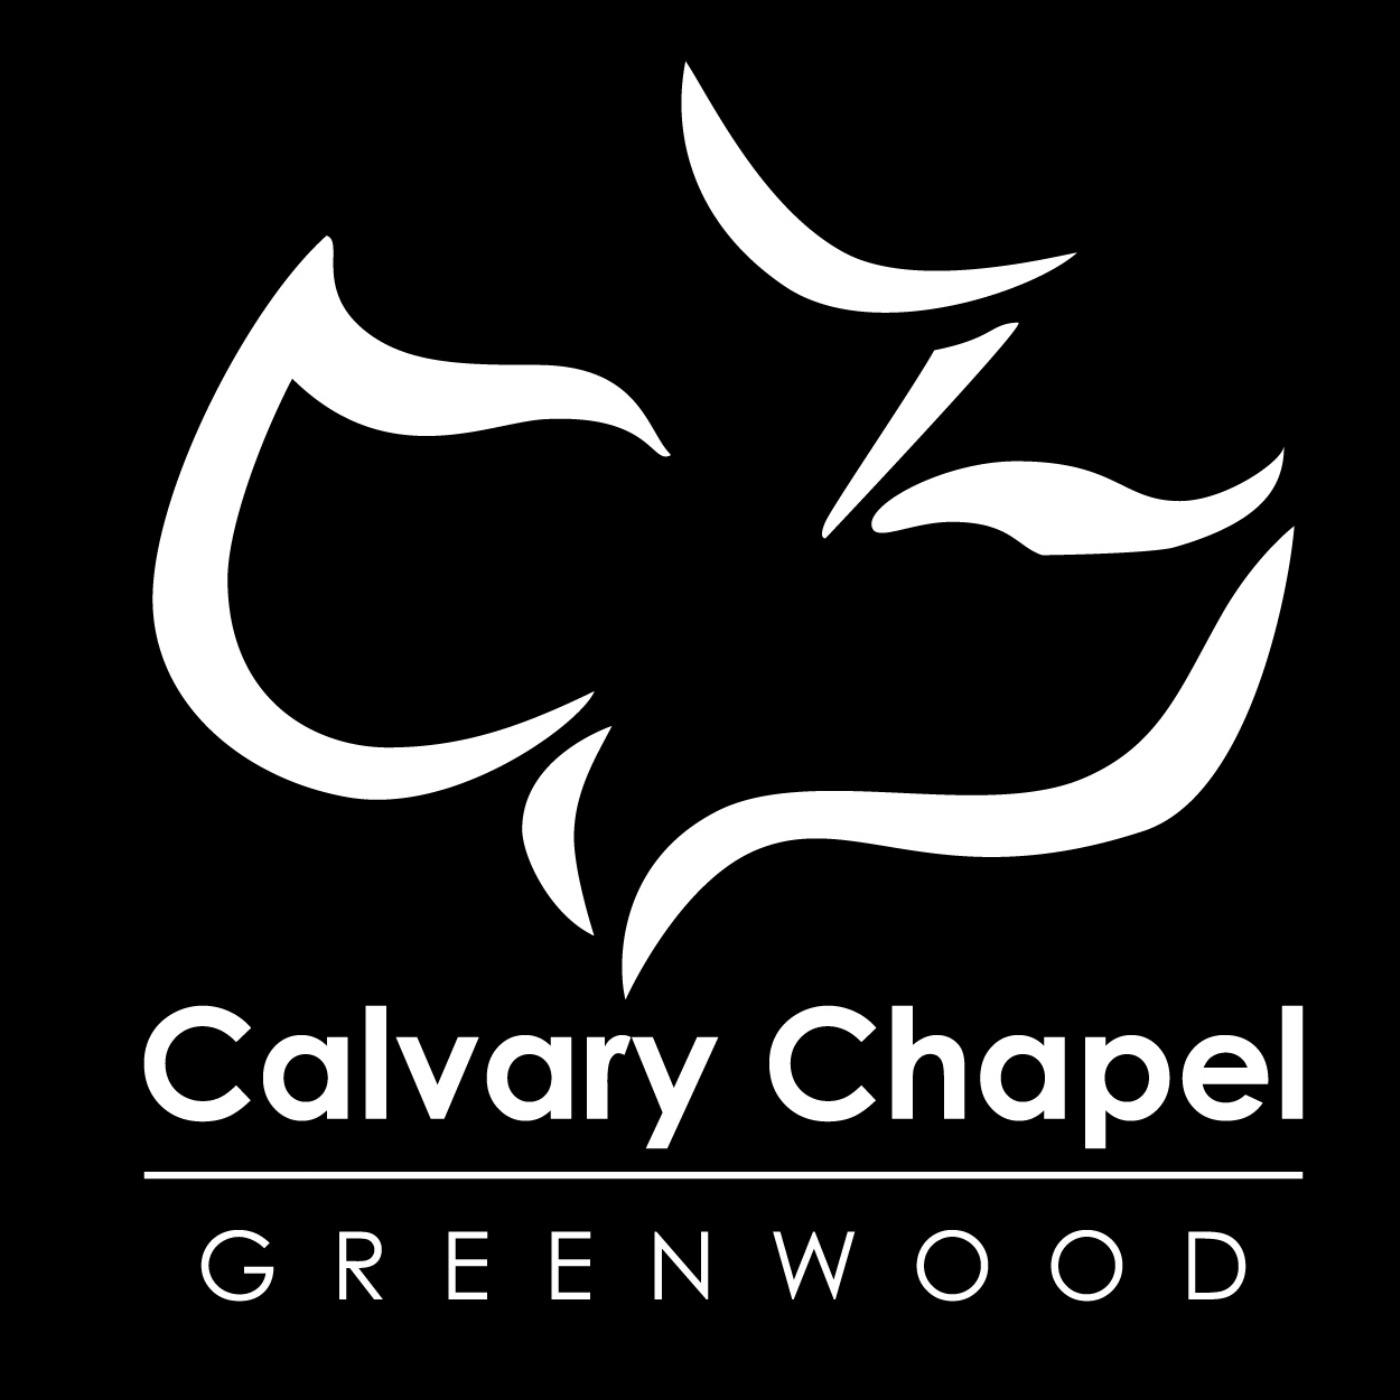 Calvary Chapel Greenwood